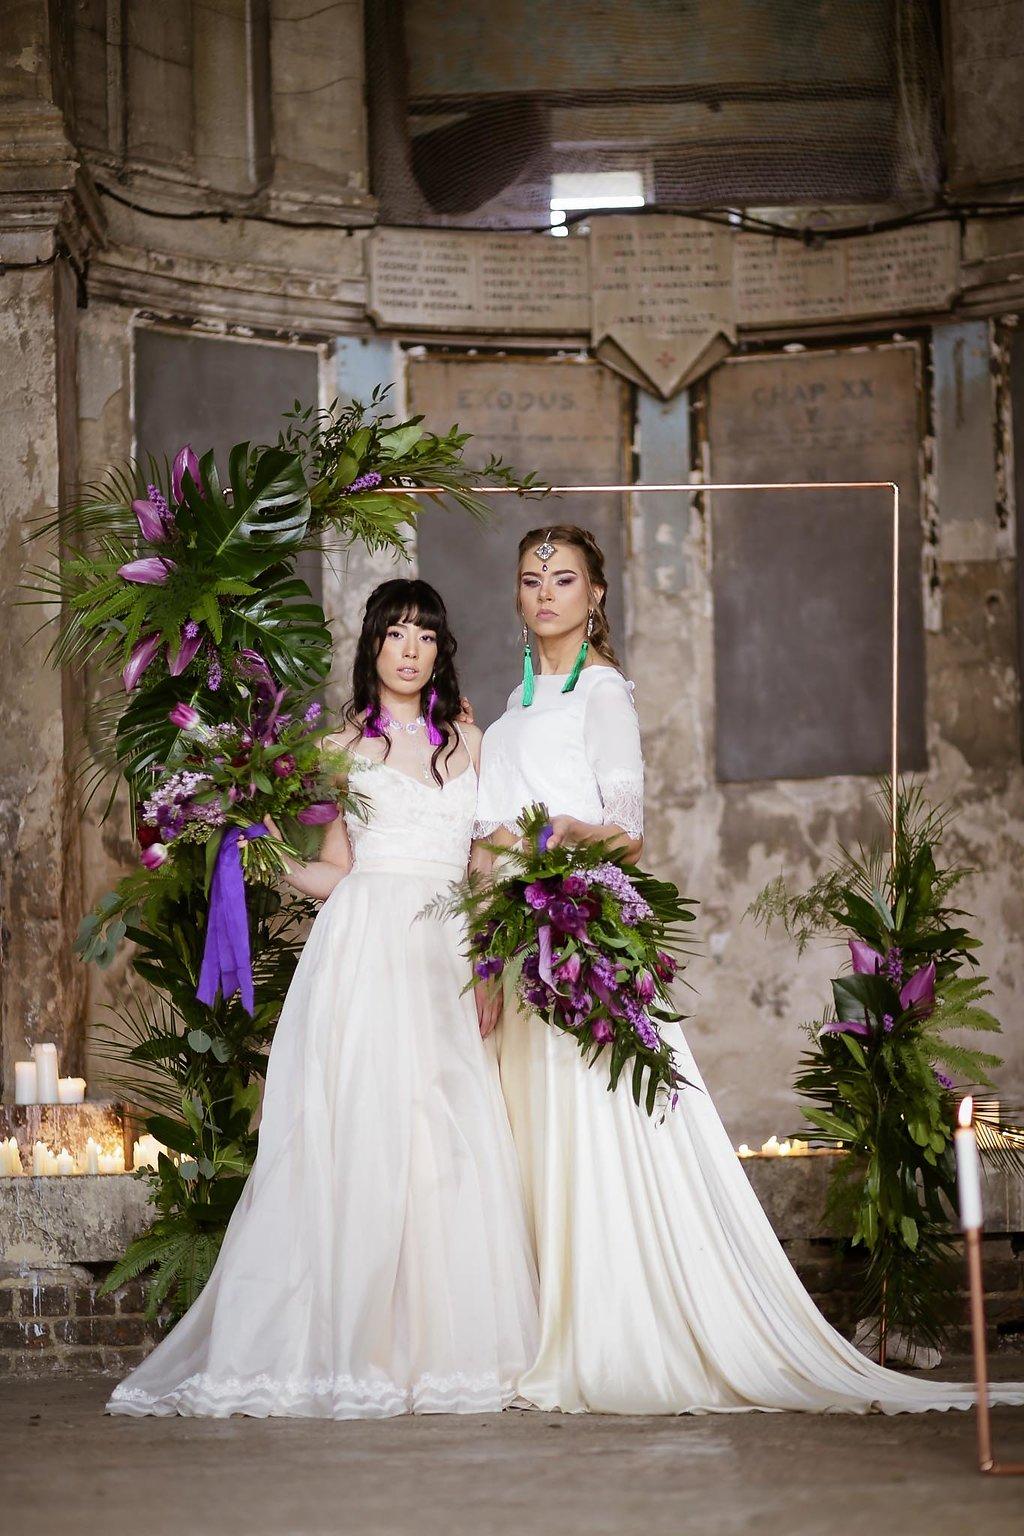 Rock the Purple Love - Gido Weddings - The Asylum Chapel - alternative wedding inspiration 110 - urban modern wedding